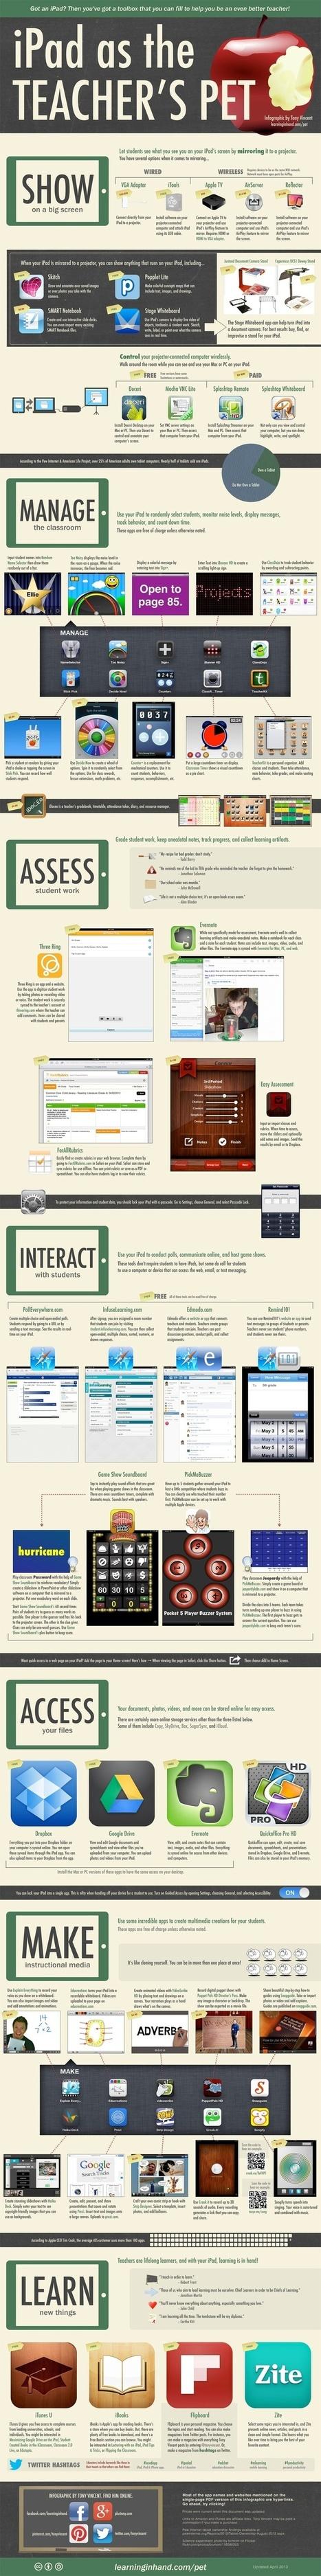 Educational Technology | Each One Teach One, Each One Reach One | Scoop.it